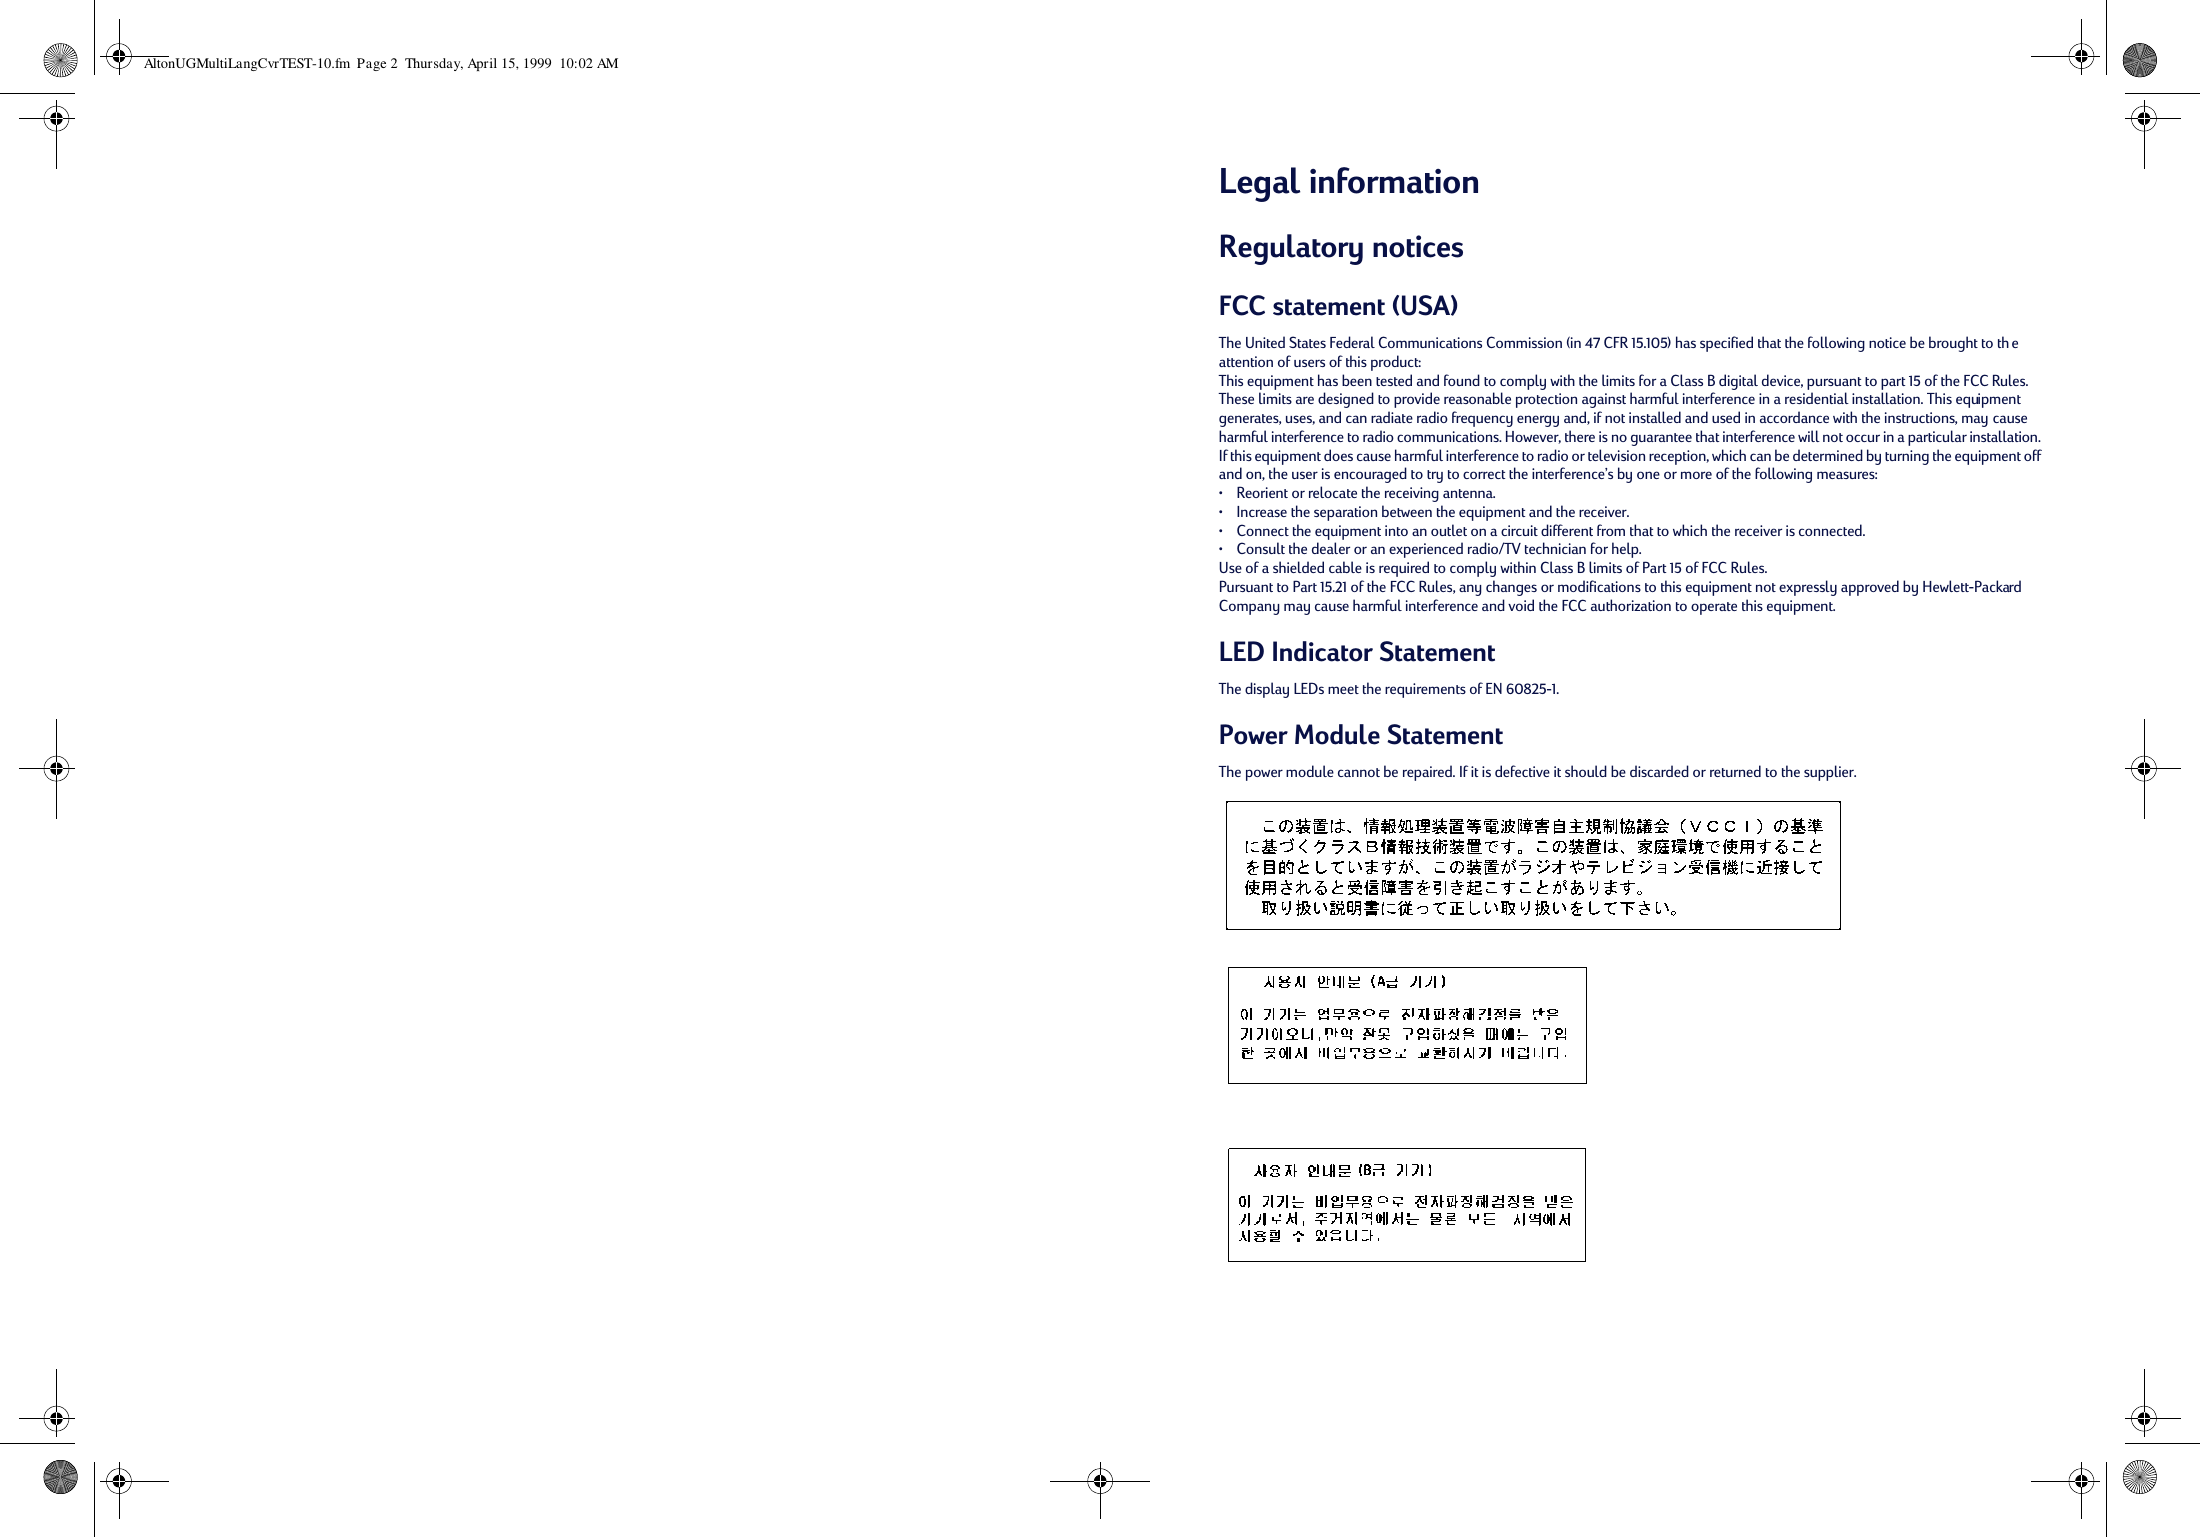 HP Alton EuroUG (Hungarian) User's Guide C6450 90004 Bpd06878